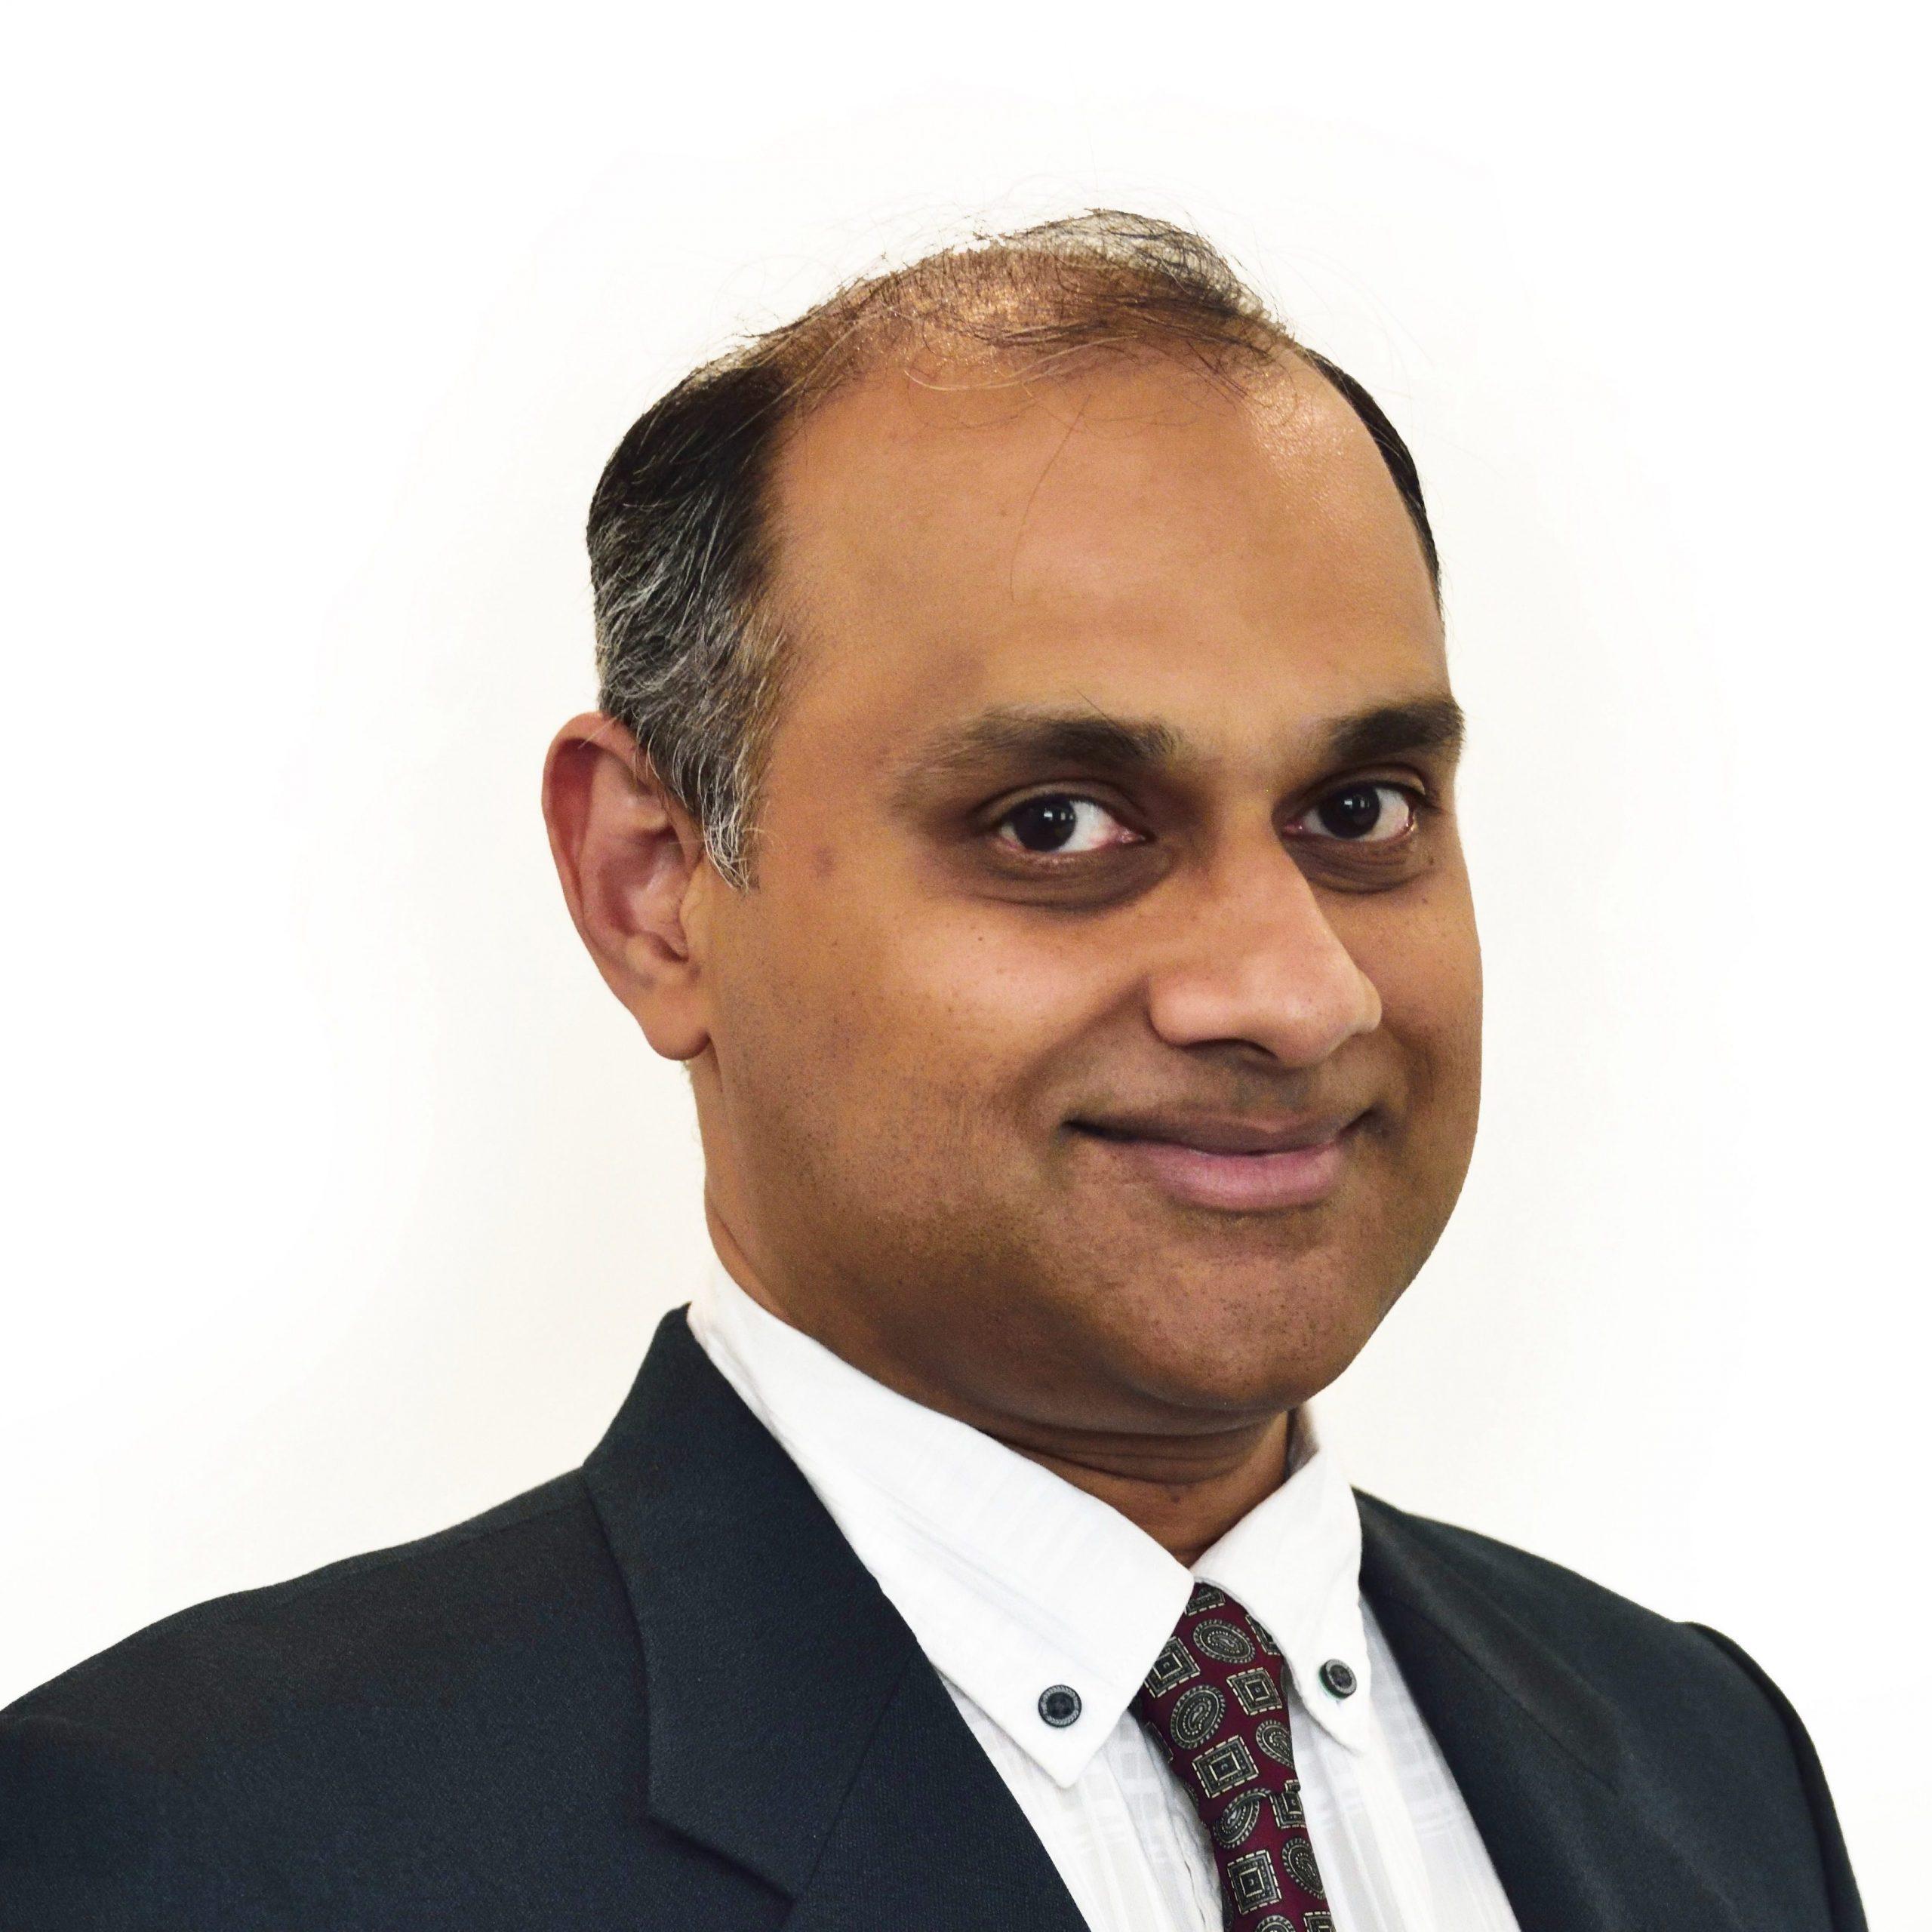 Mr Jacob Kanianthara